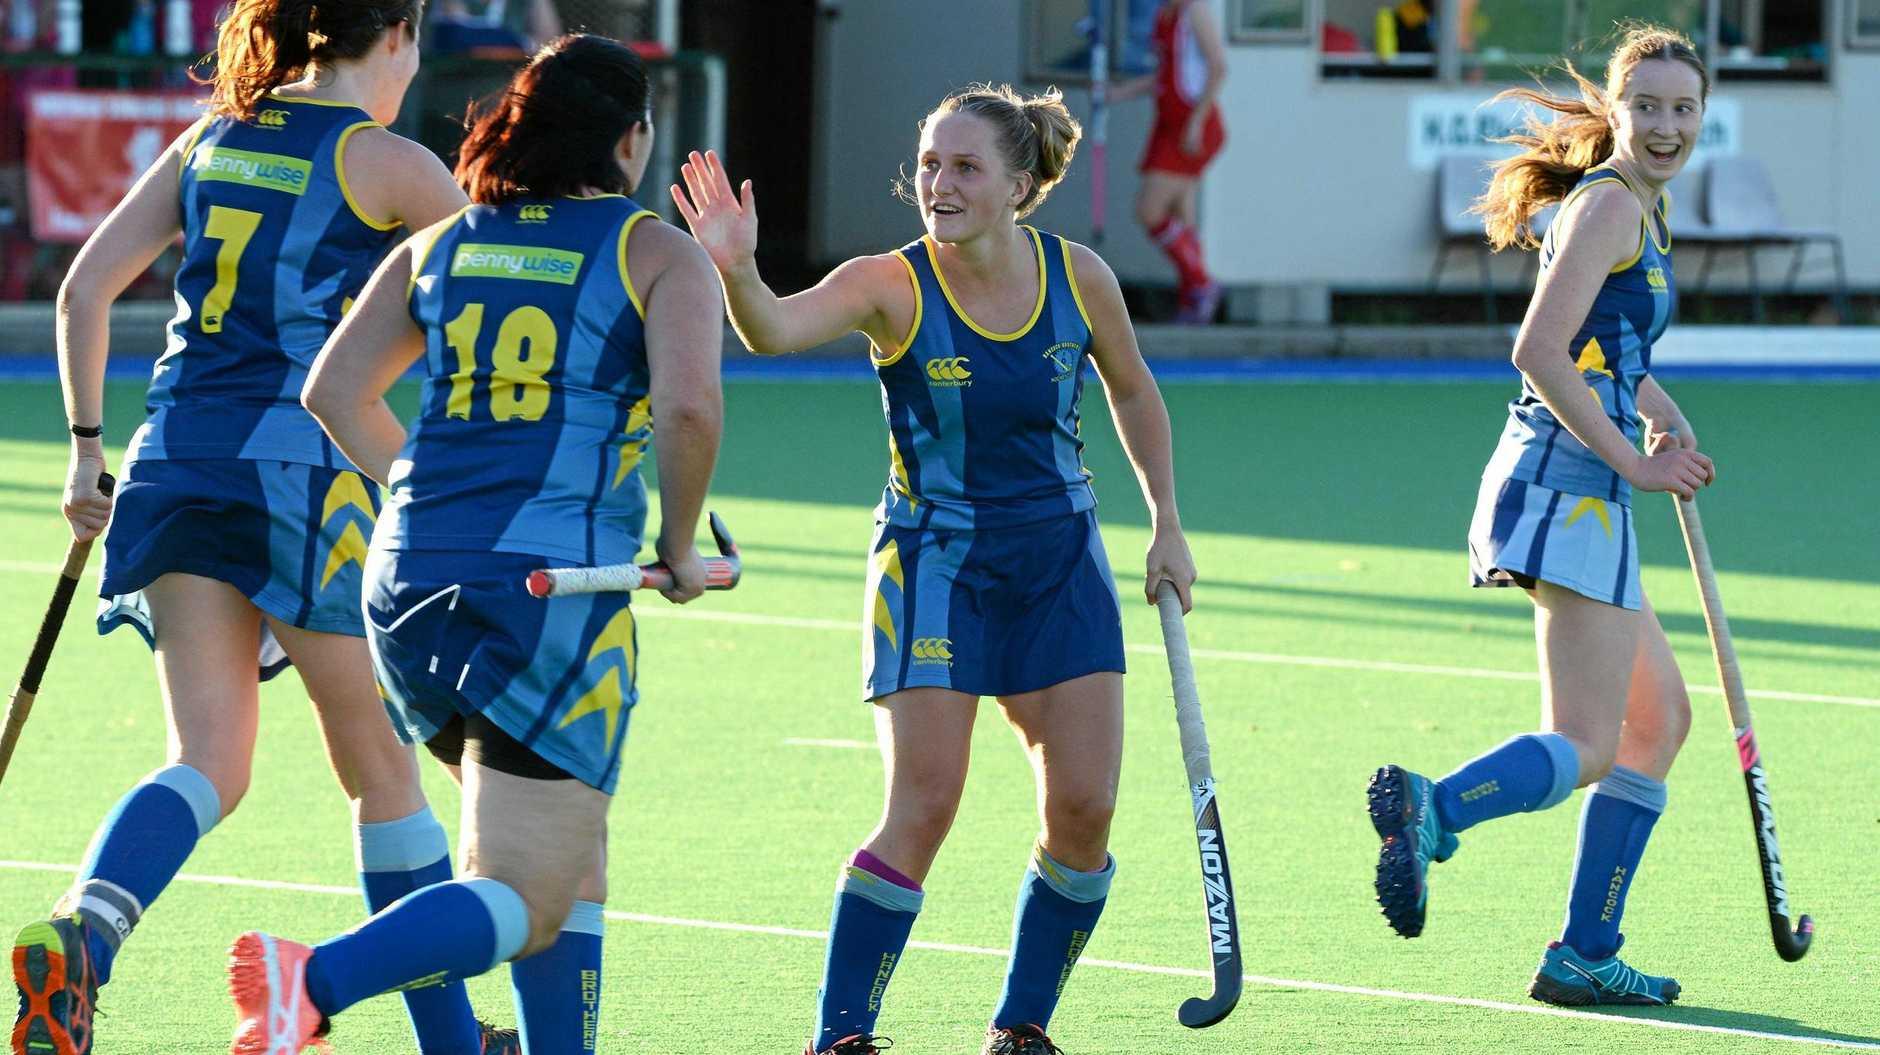 Hancocks goalscorer Robyn Clark celebrates with her teammates.